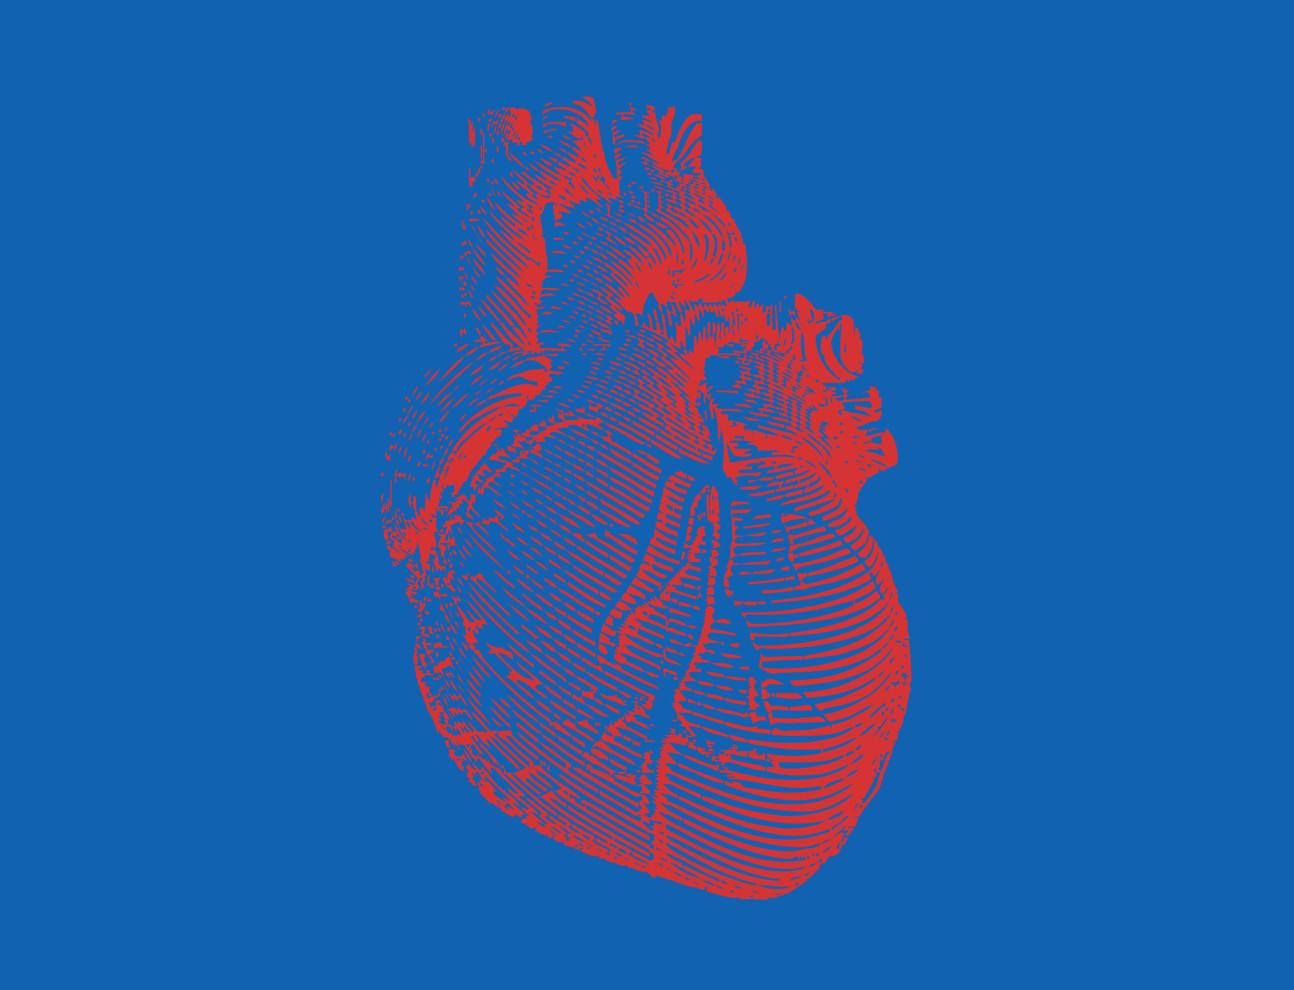 An illustration of a human heart